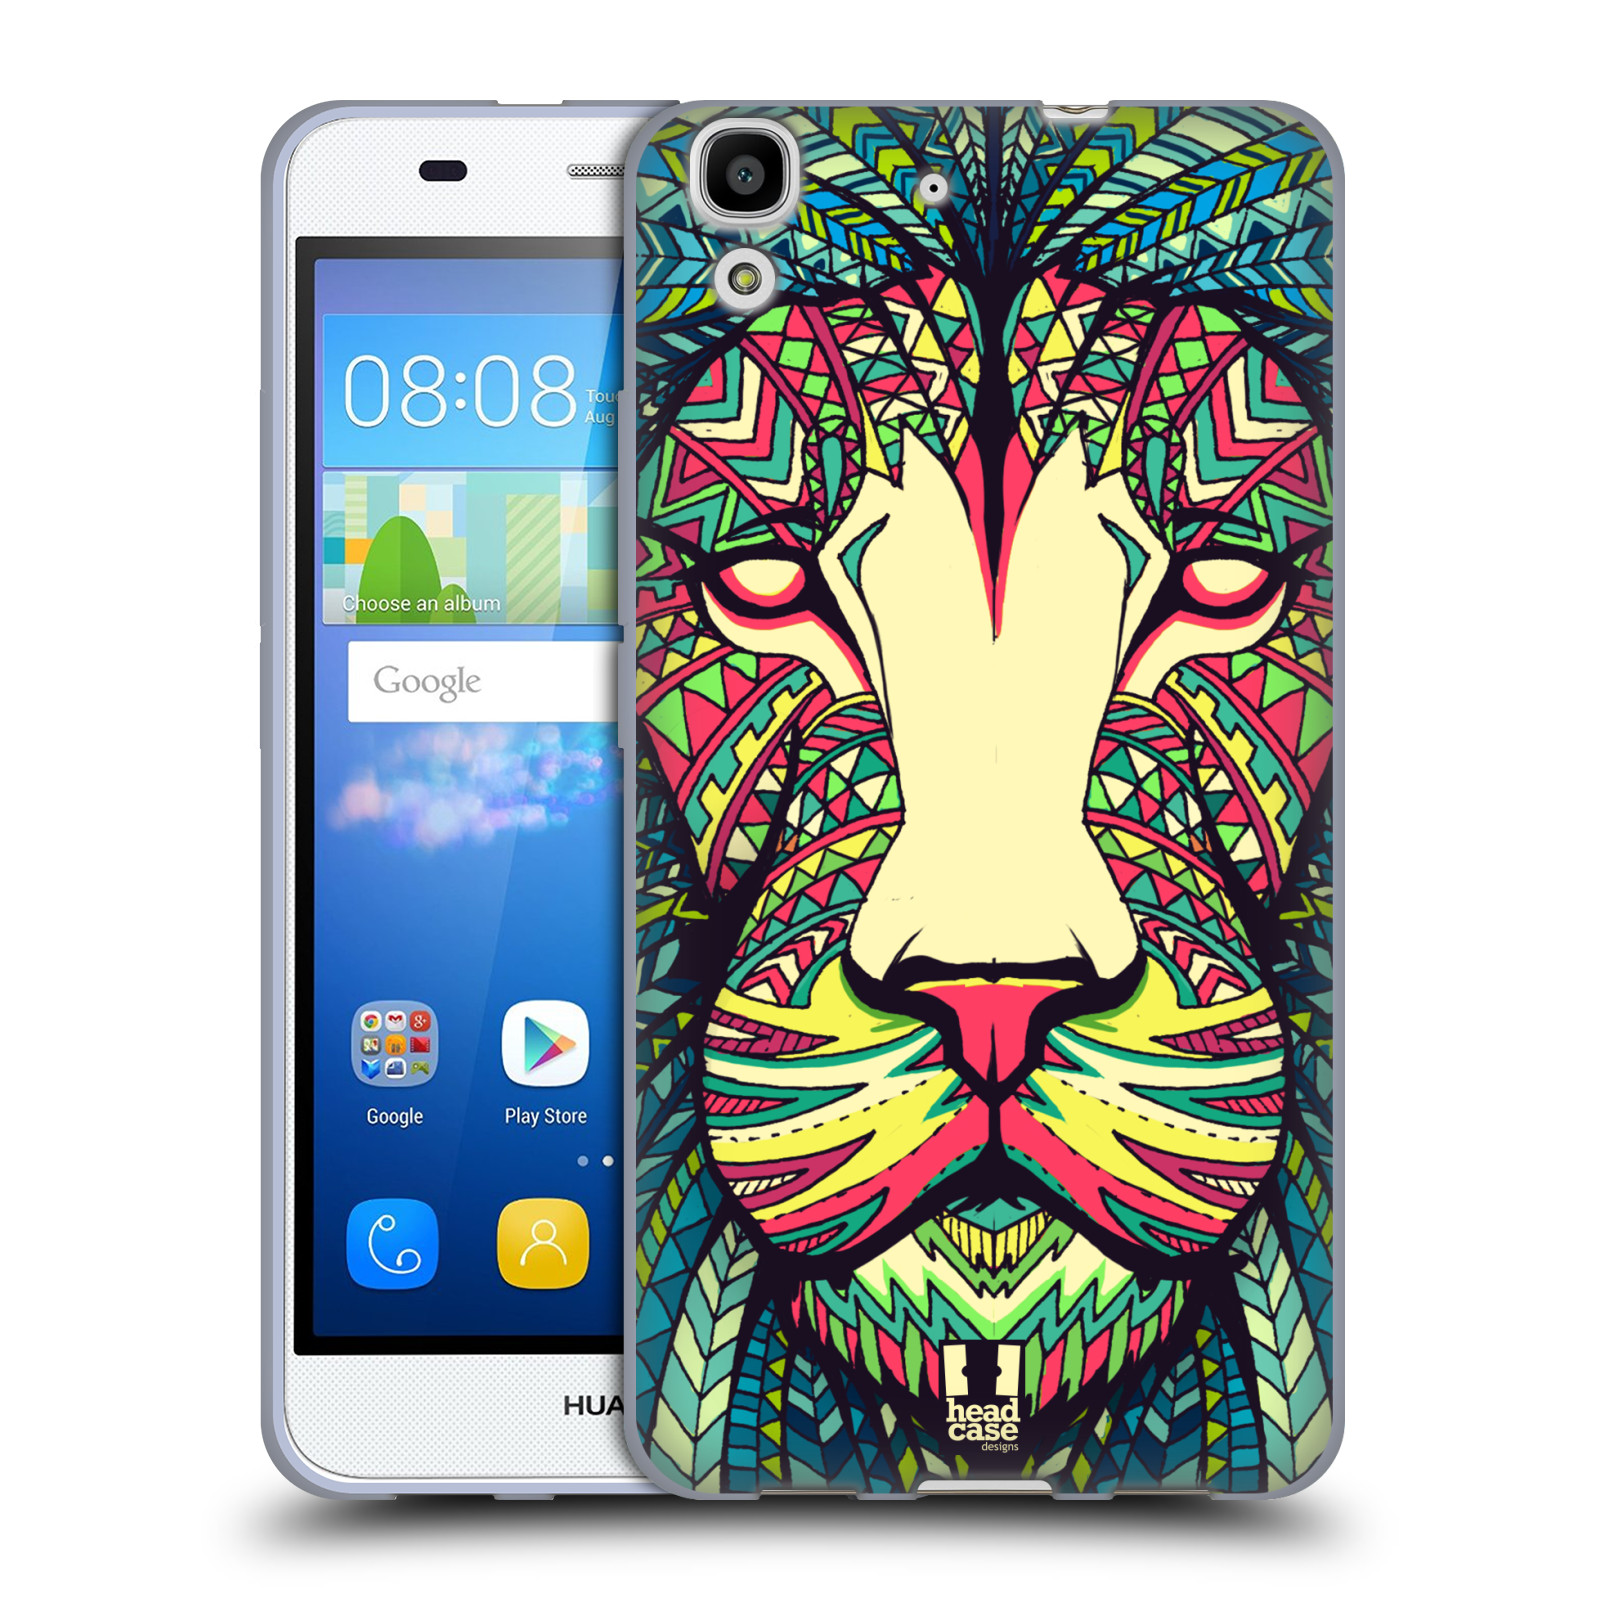 HEAD CASE silikonový obal na mobil HUAWEI Y6 vzor Aztécký motiv zvíře lev